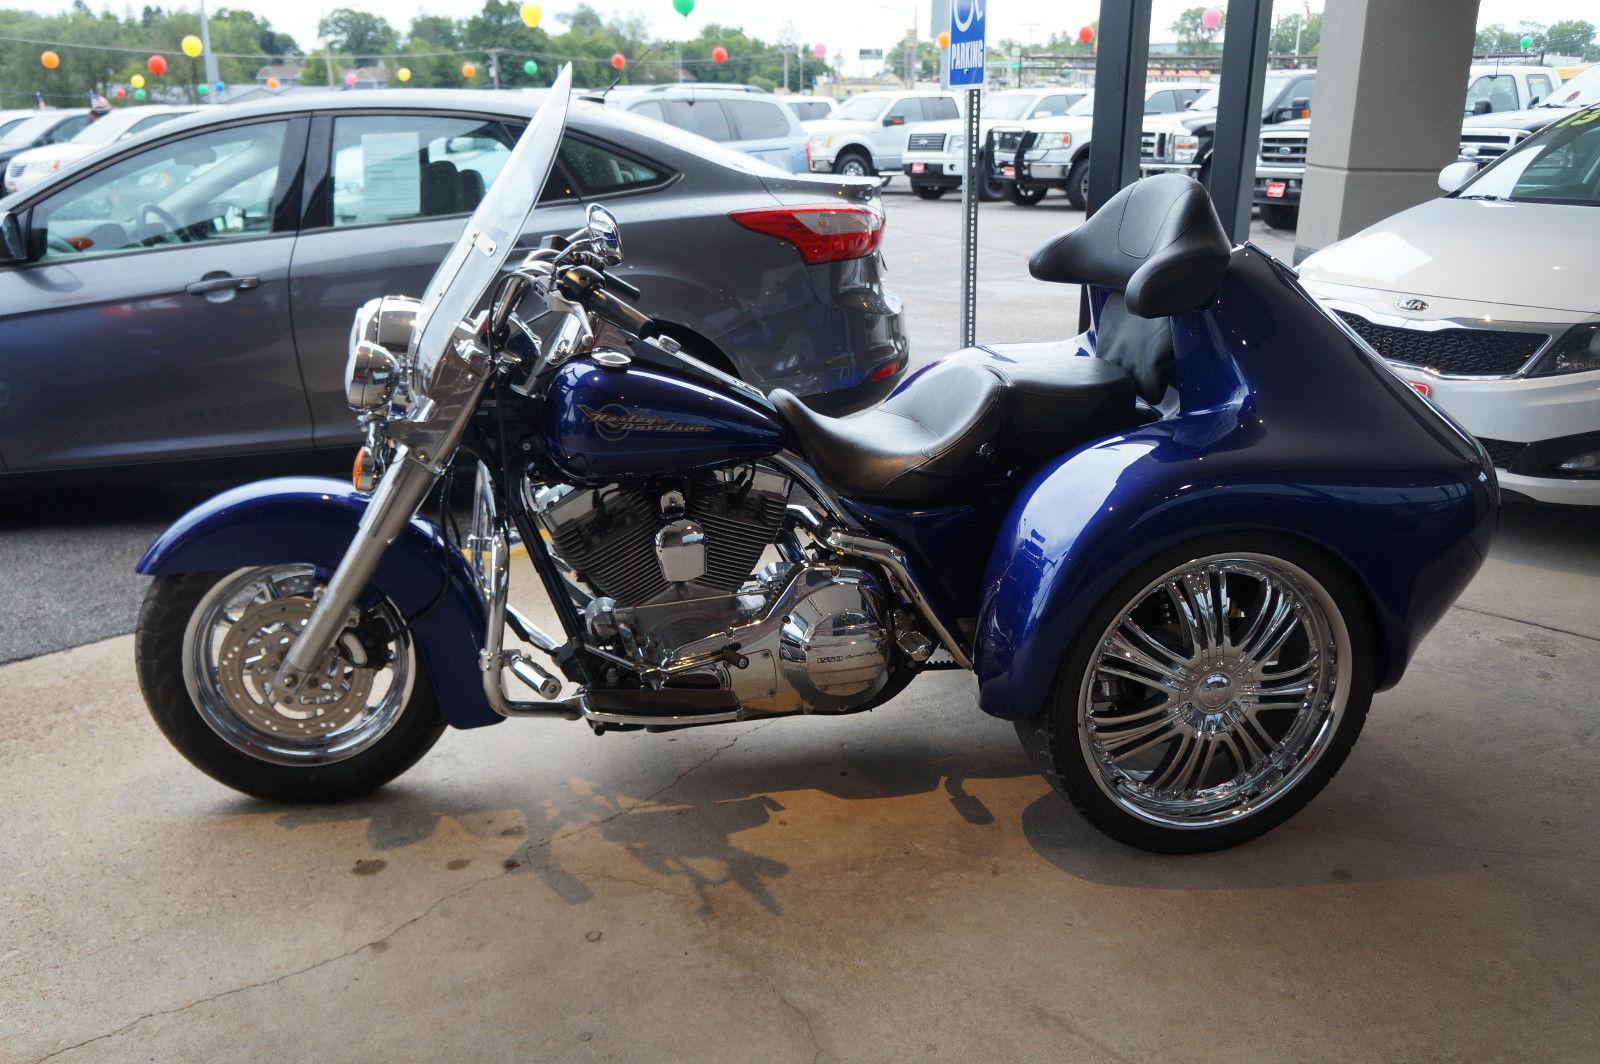 Dft Trikes Dft Home >> 2006 Harley Davidson Road King DFT Trike